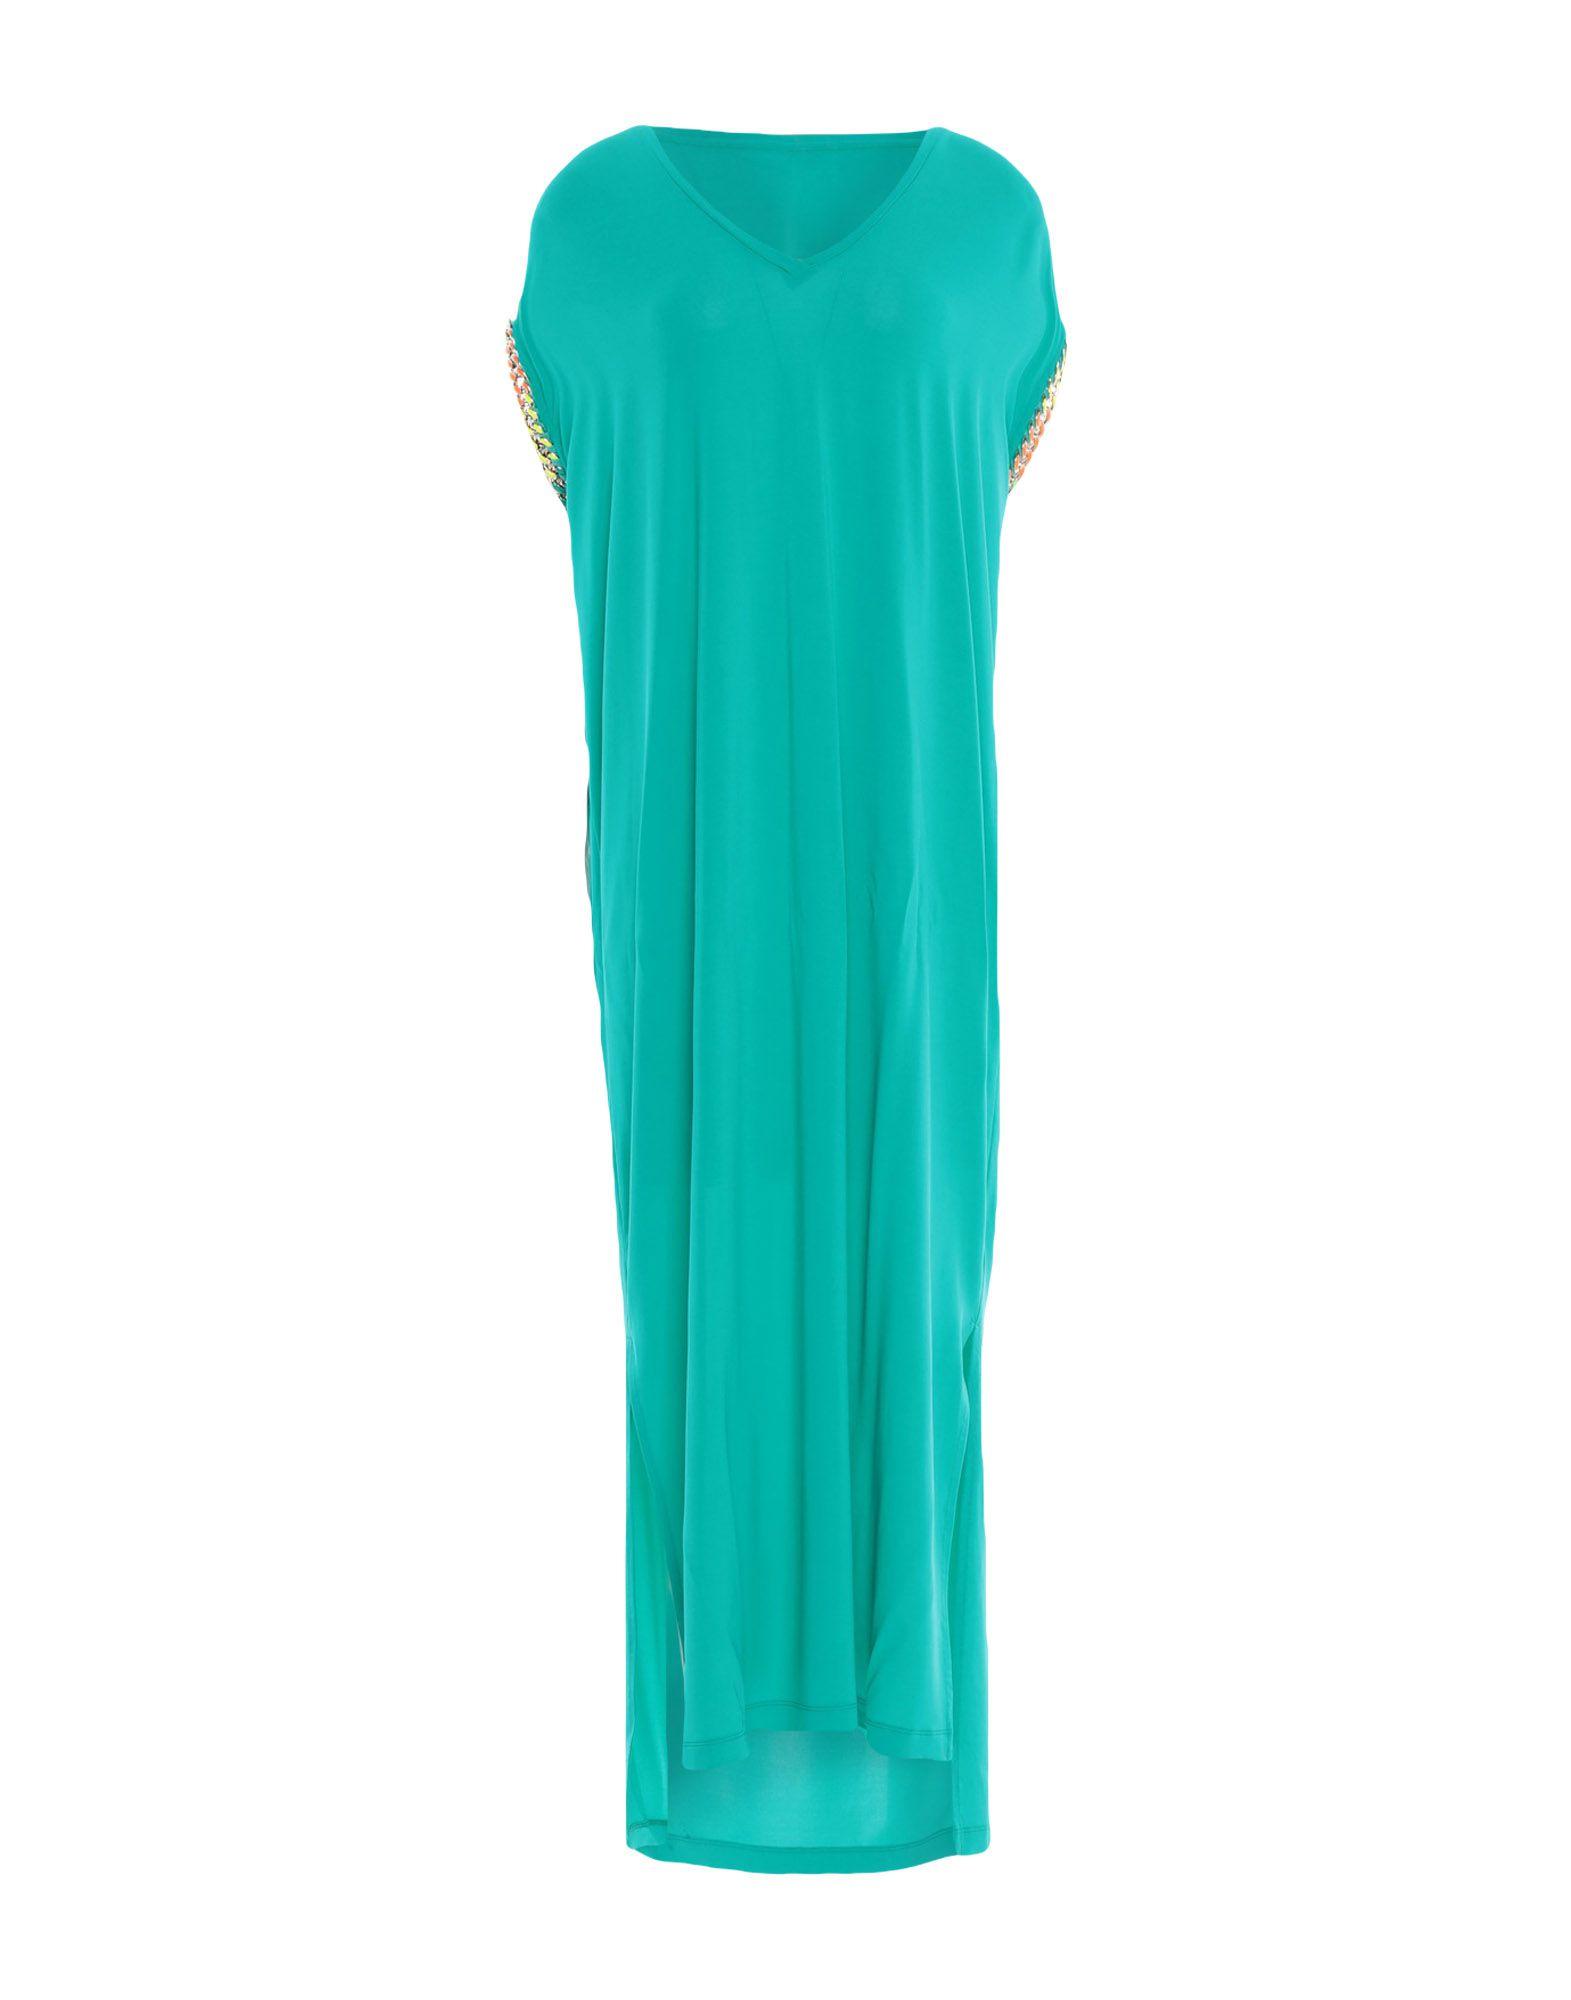 22 MAGGIO by MARIA GRAZIA SEVERI Платье длиной 3/4 свободное платье с гипюром 22 maggio